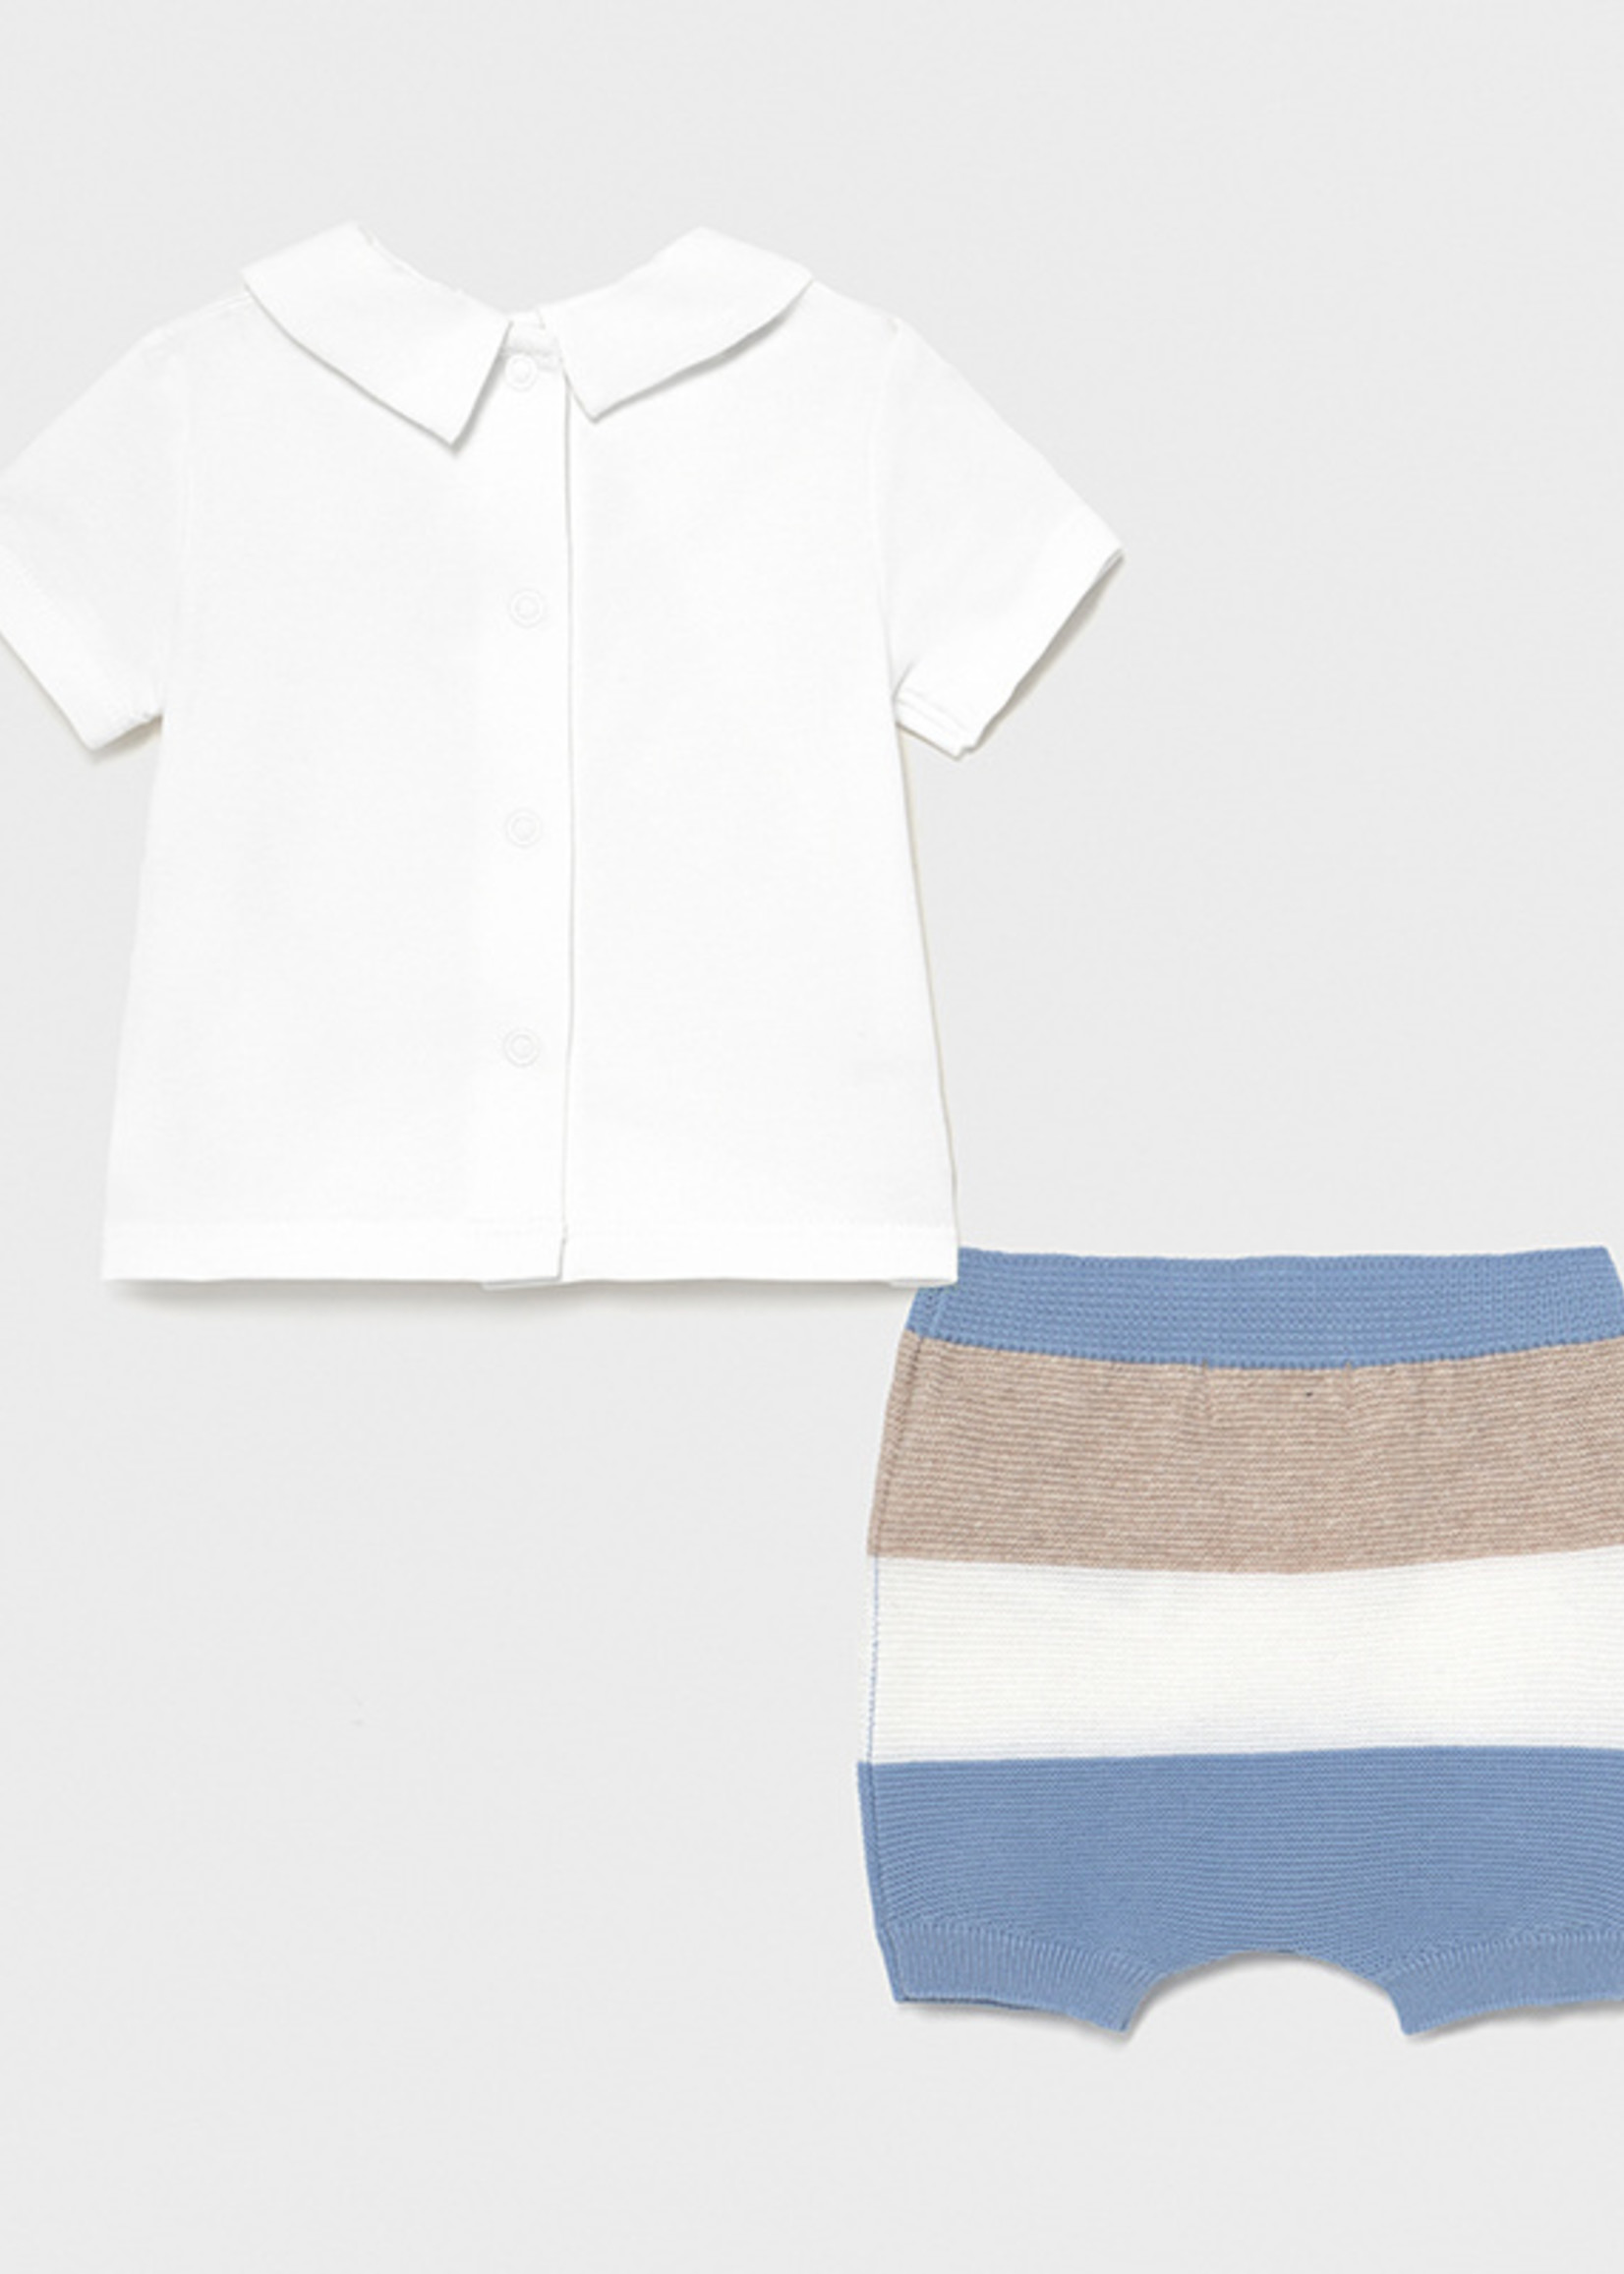 Mayoral Mayoral striped shorts set for newborn boy